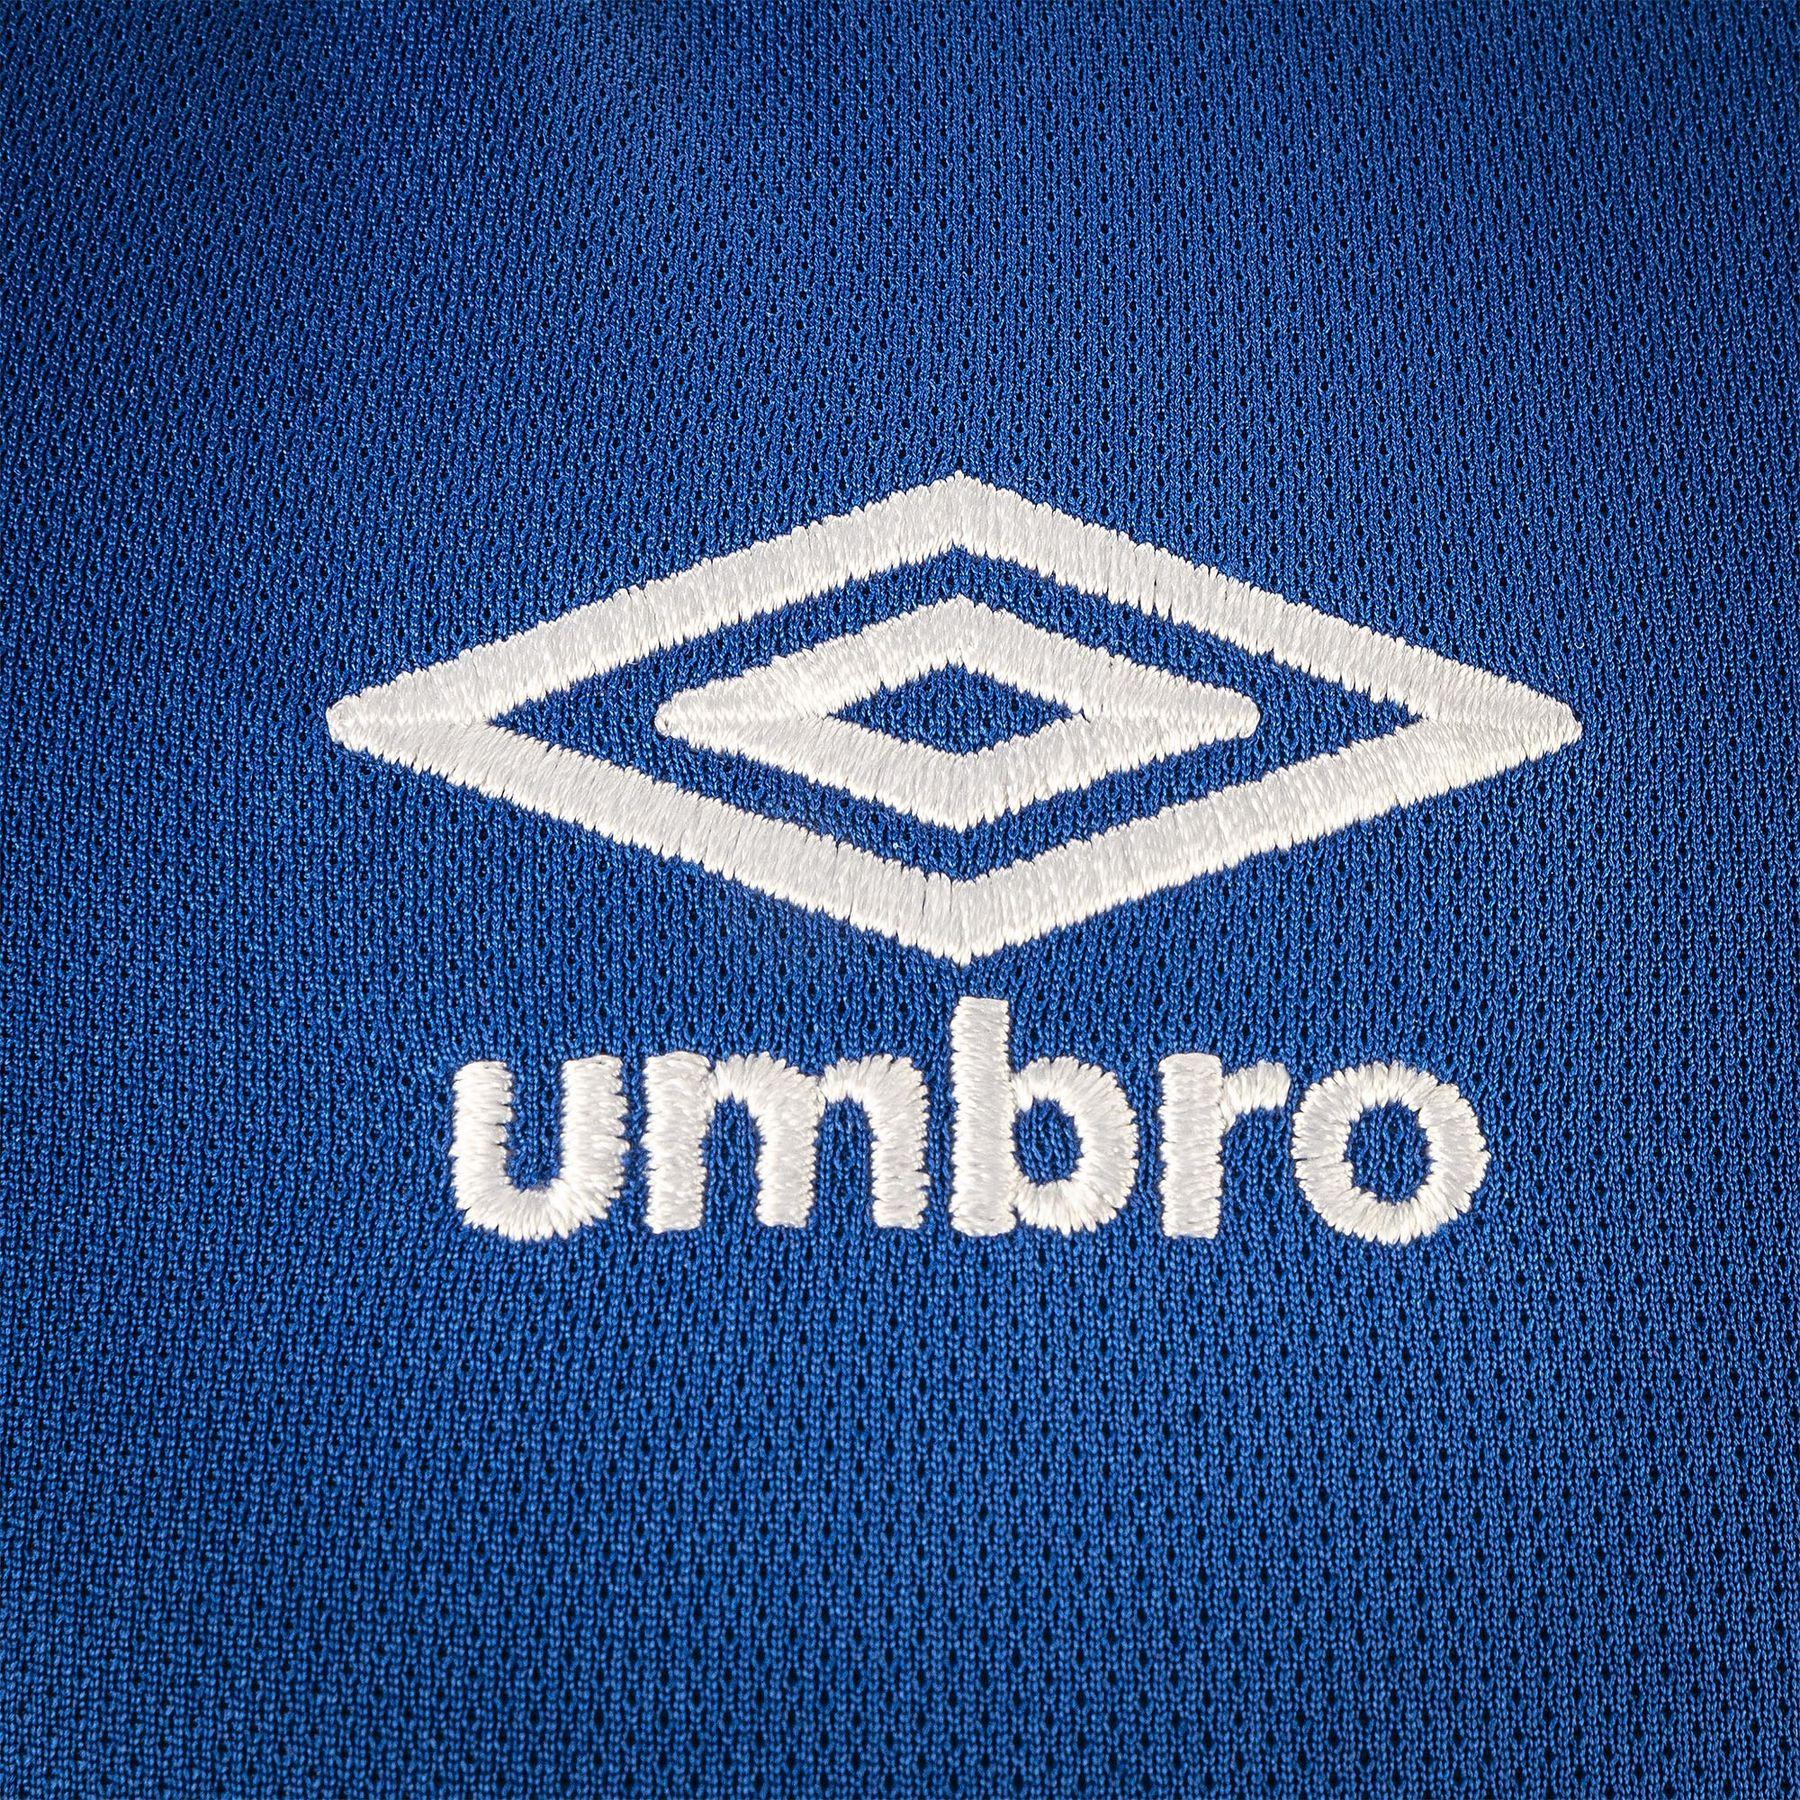 Schalke 04 2020-21 Umbro Home Kit | 20/21 Kits | Football shirt blog